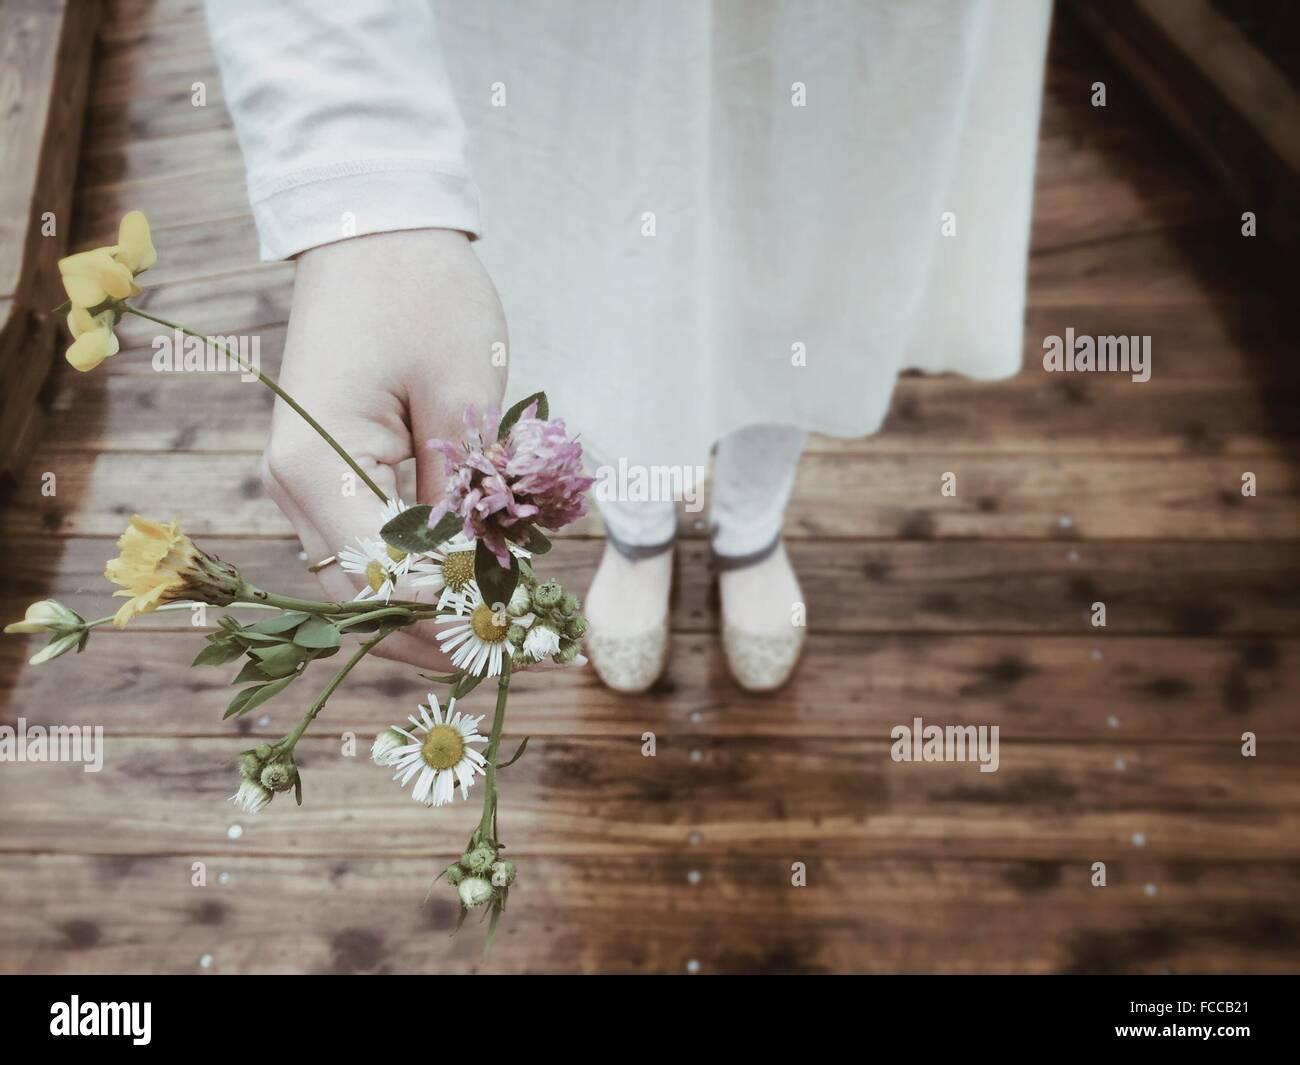 Woman Standing On Boardwalk Holding Flowers - Stock Image